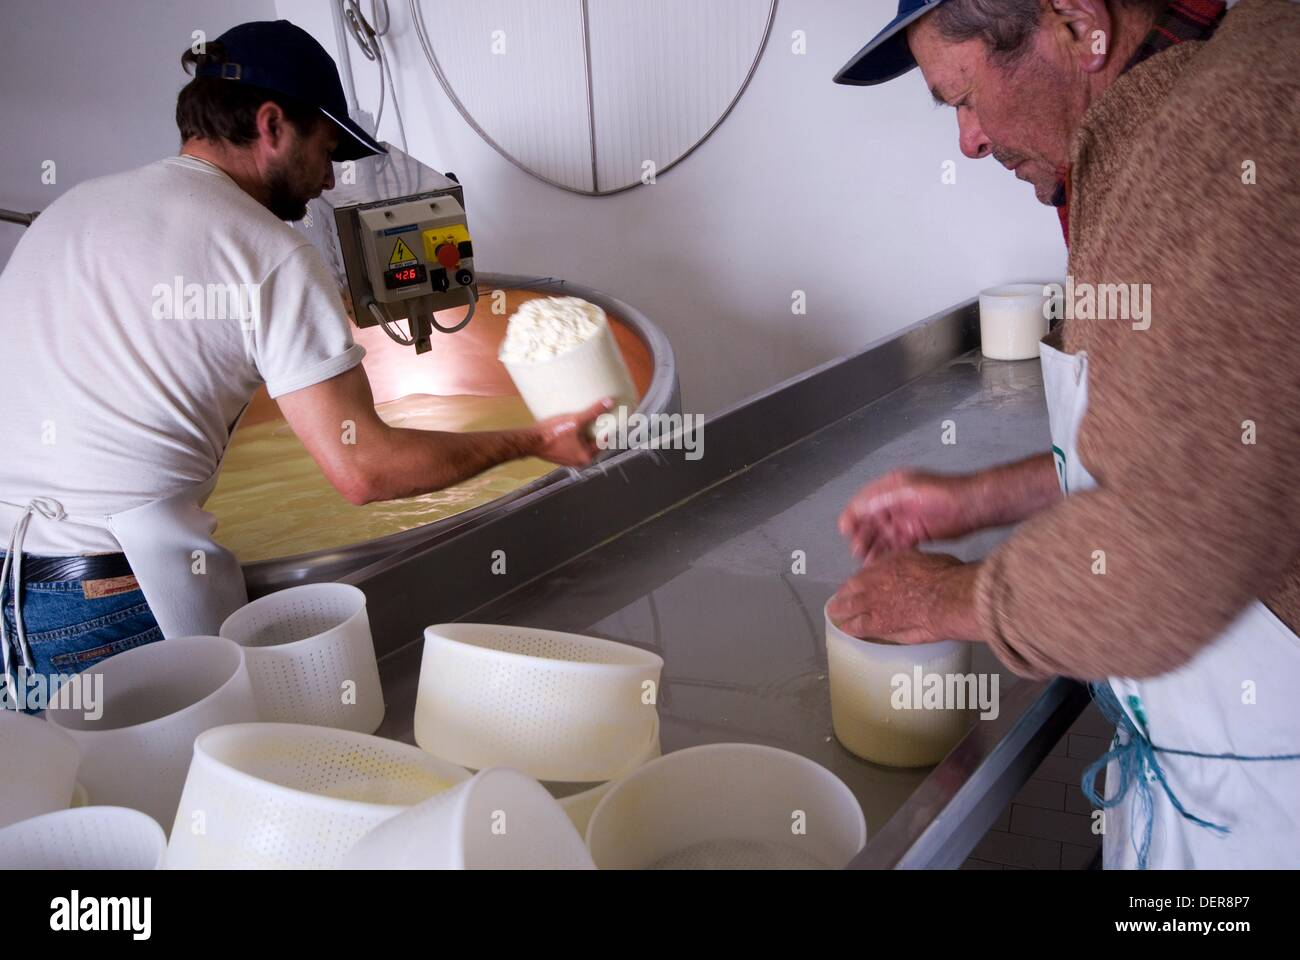 Italy, Valdobbiadene, Cesen mount, production of cheese at Malga Barbaria. - Stock Image